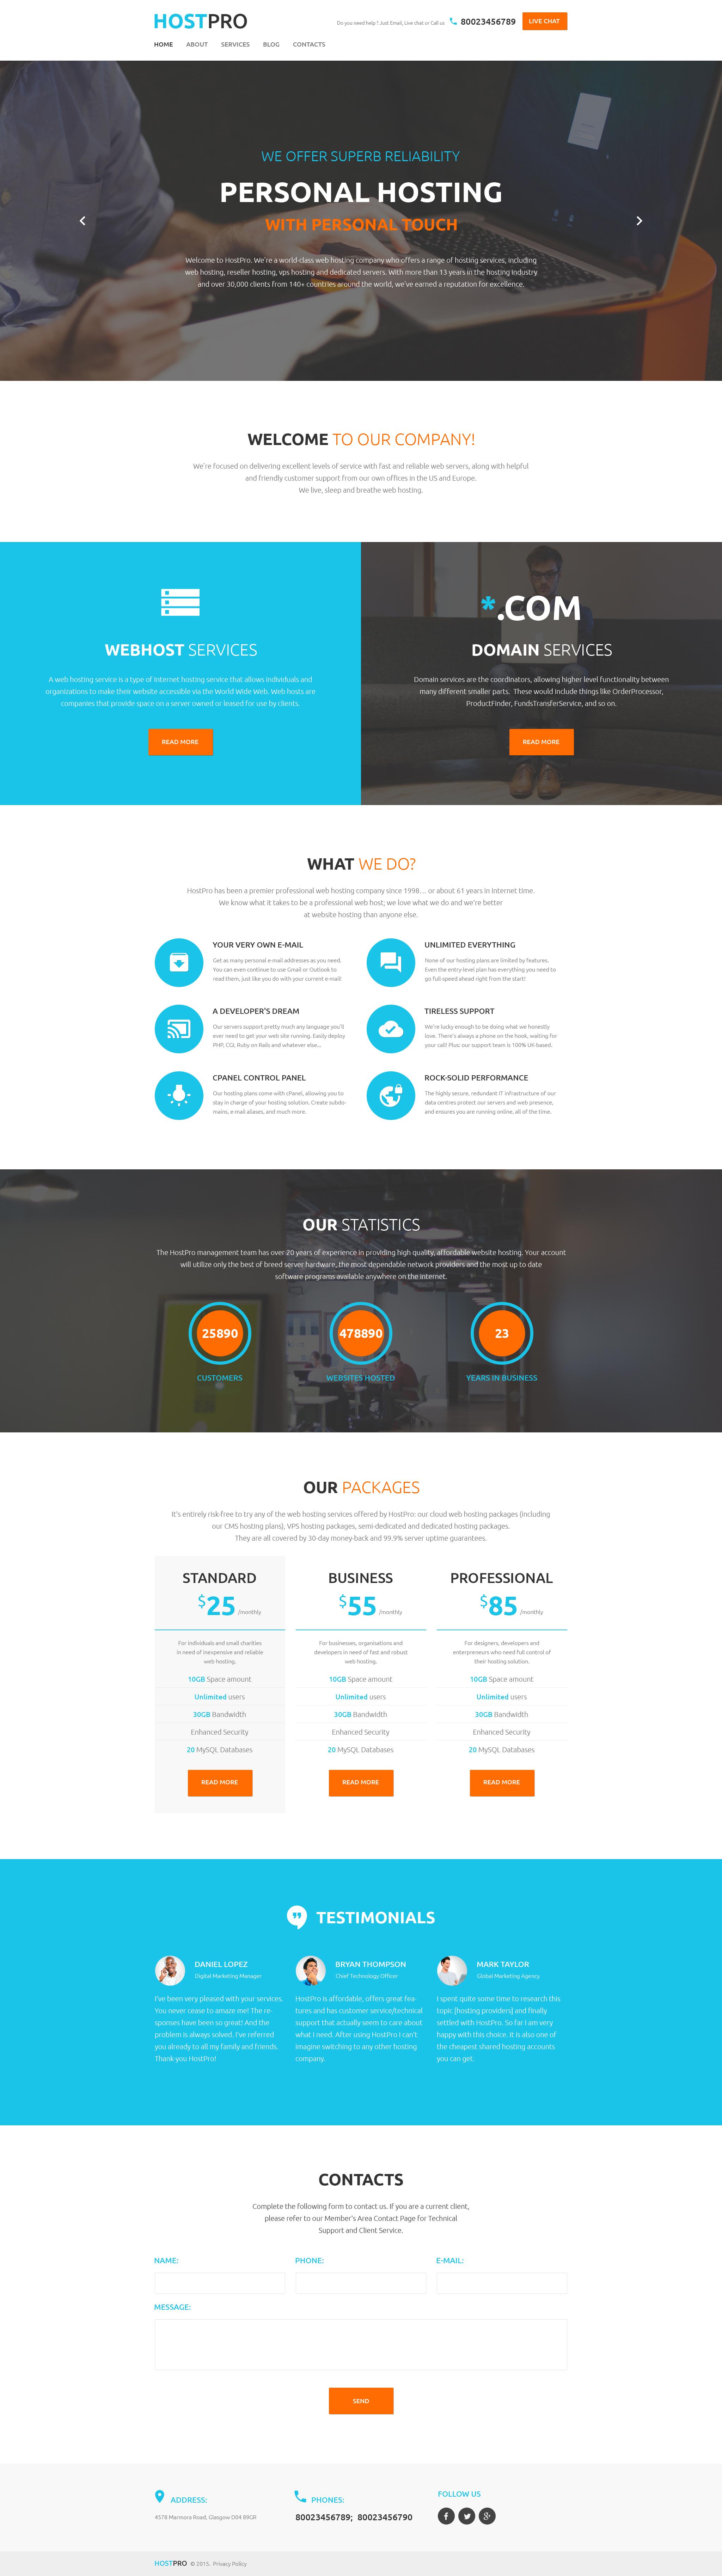 Responsivt HostPro WordPress-tema #58537